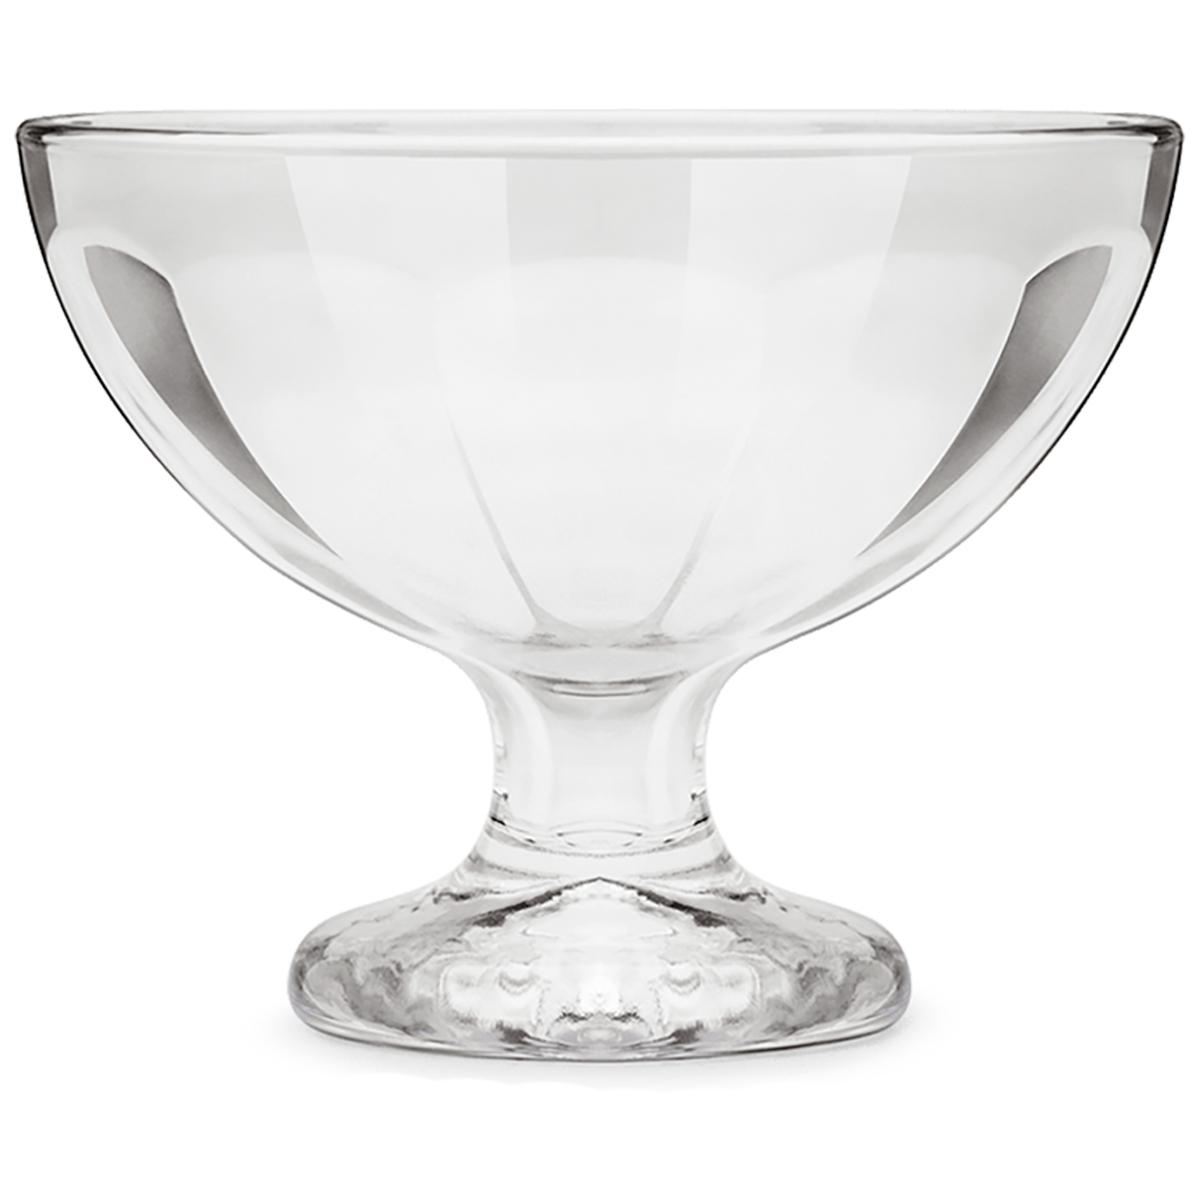 Jogo 6 Taças Sobremesa Vidro Pavillion 270ml 12x8cm Brinox